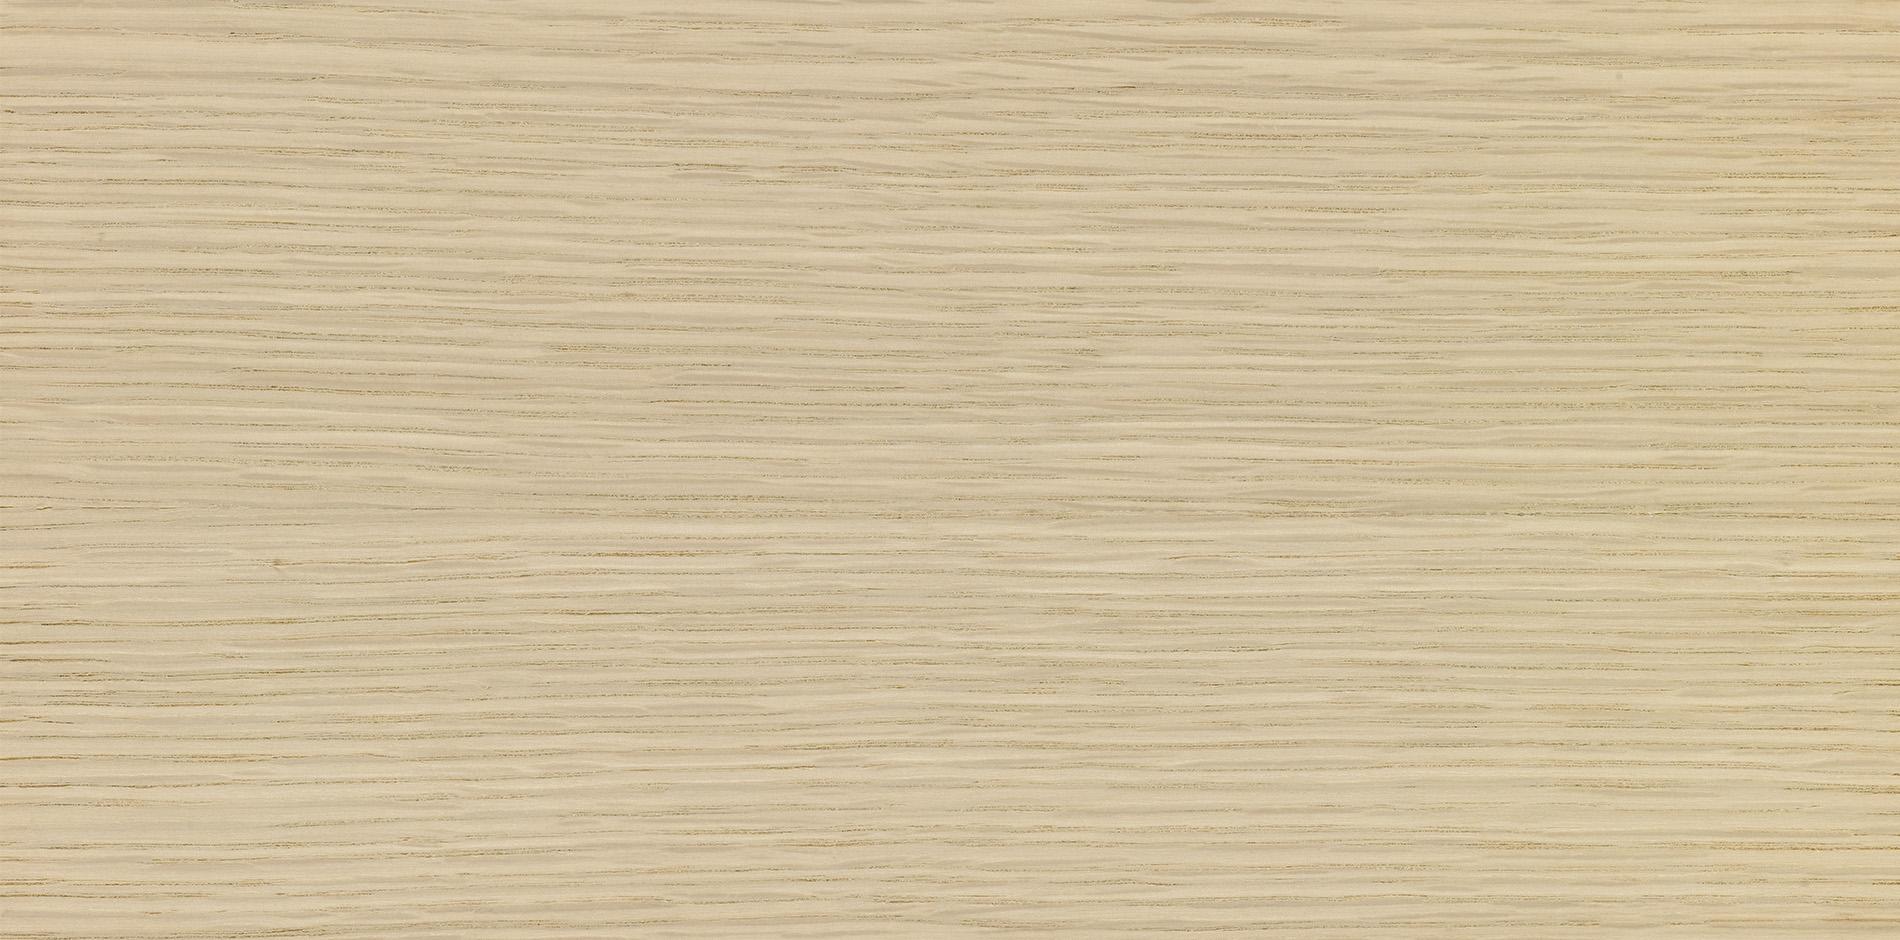 garnica_plywood__white_oak_2